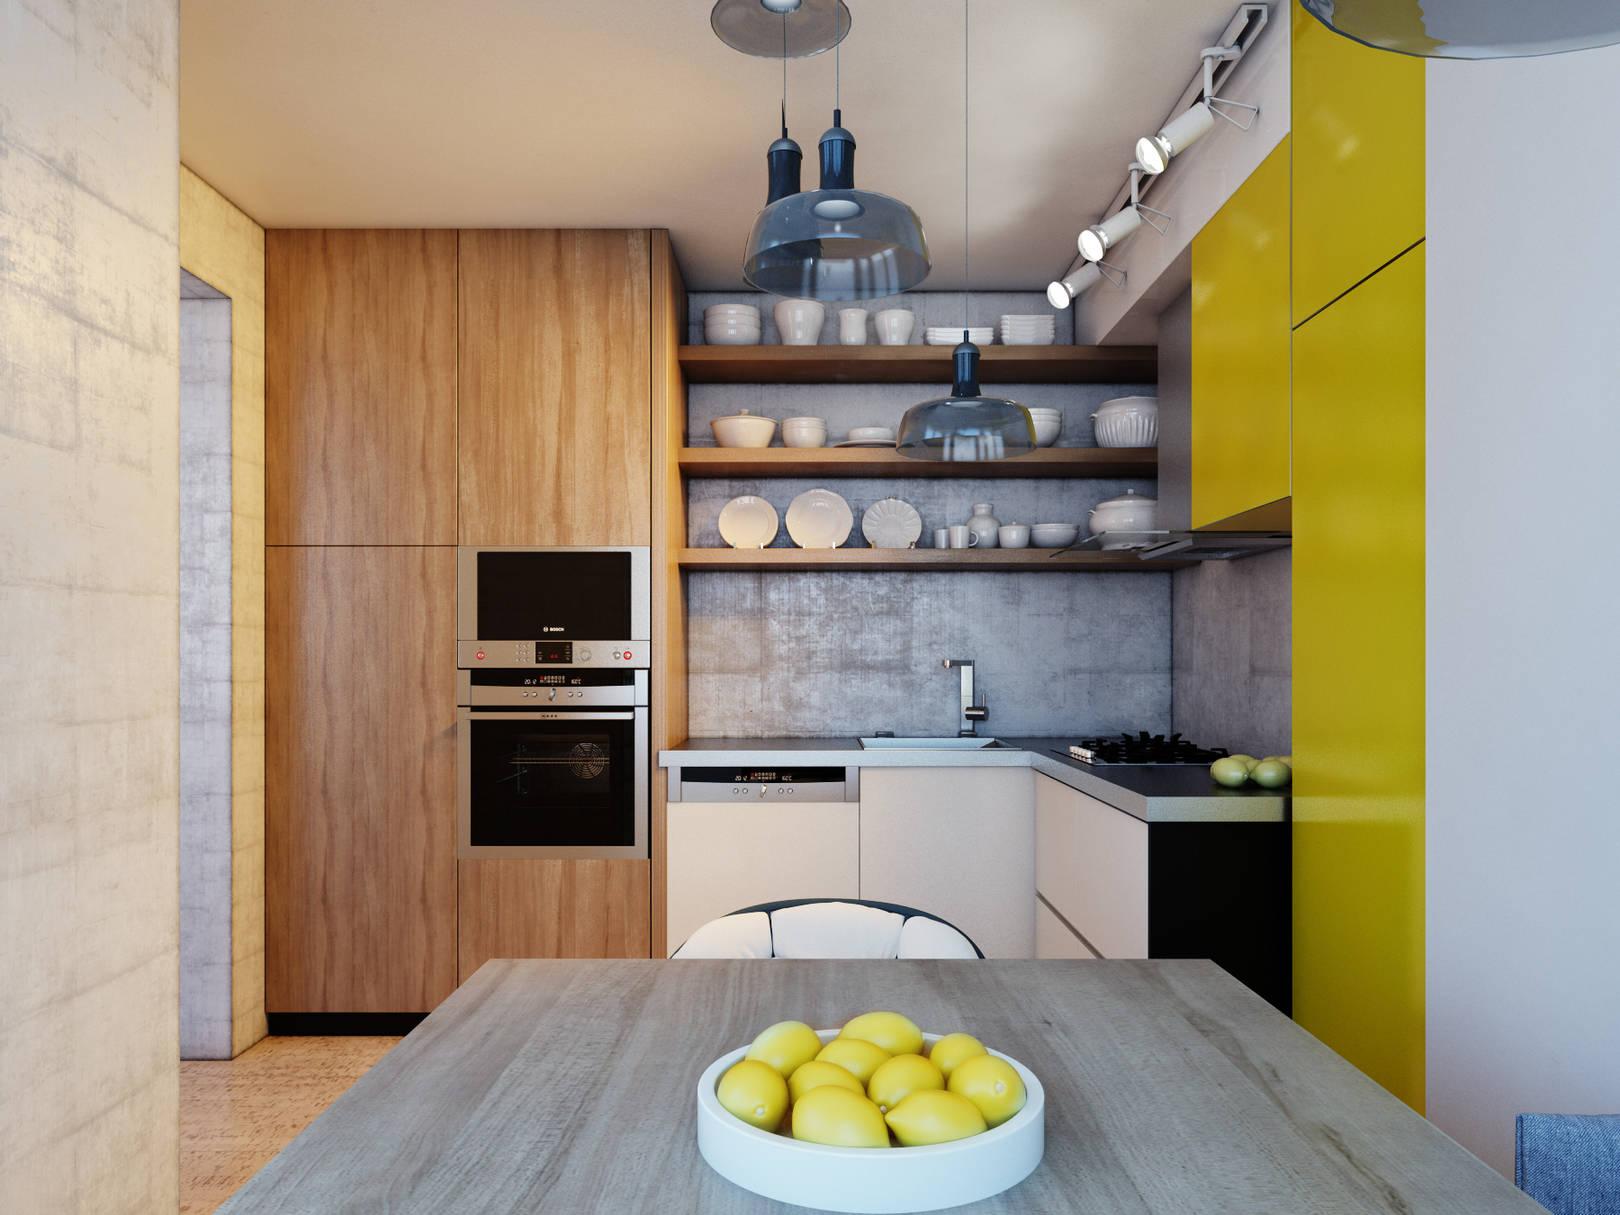 Colourful apartment